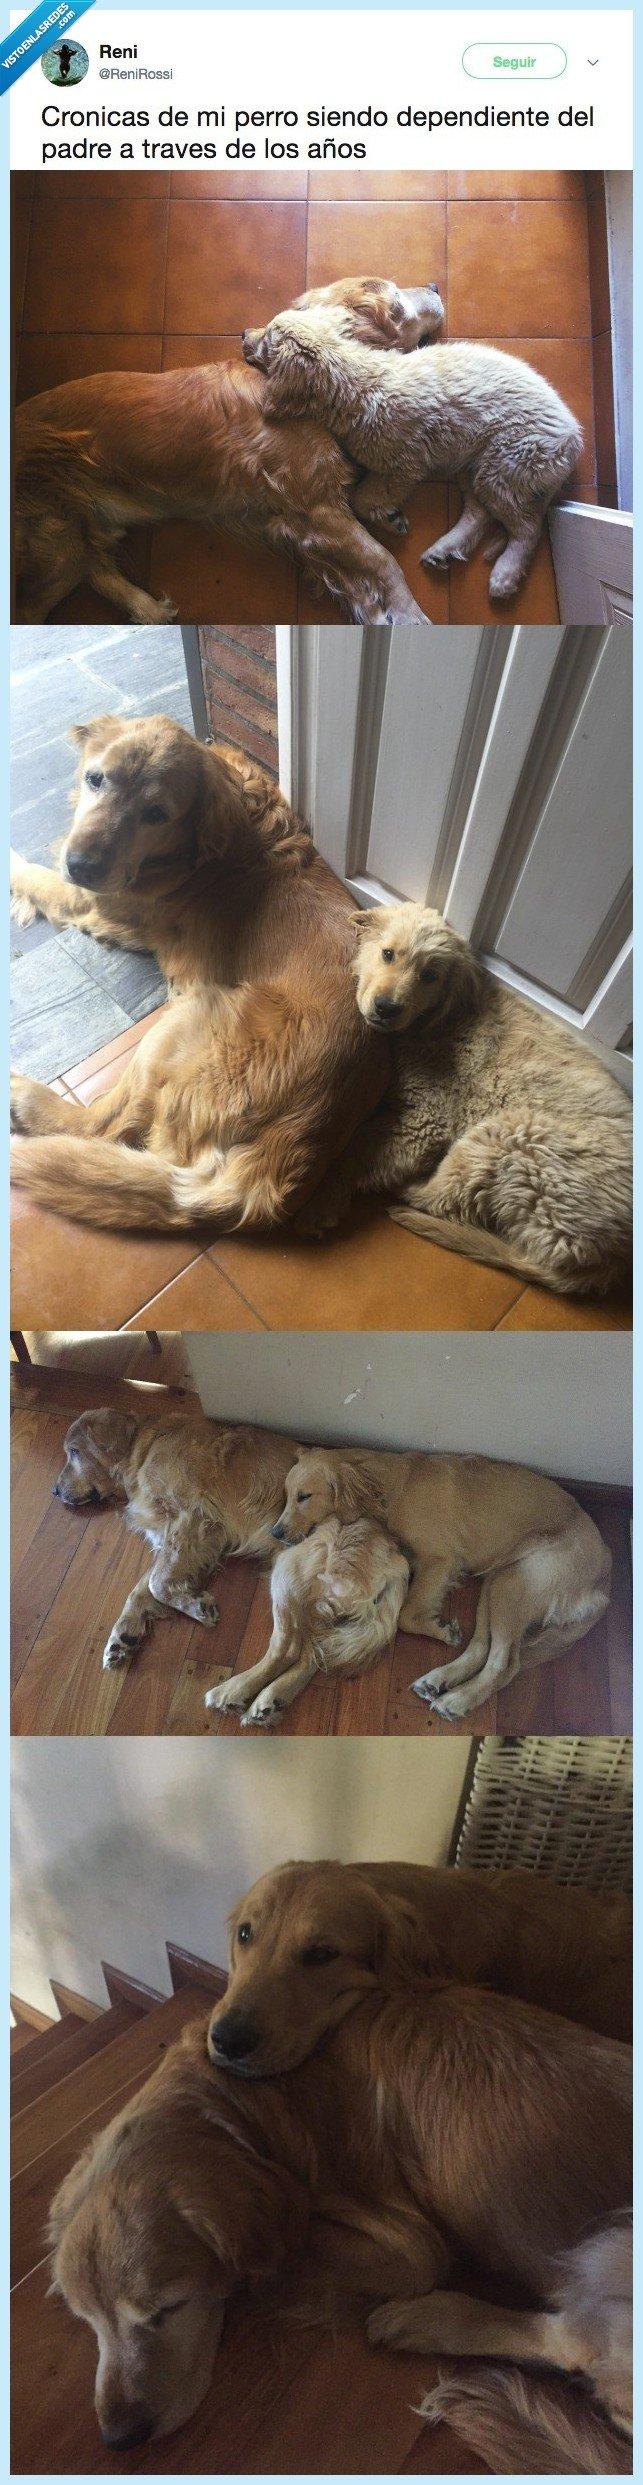 abrazar,necesitar,padre,perro